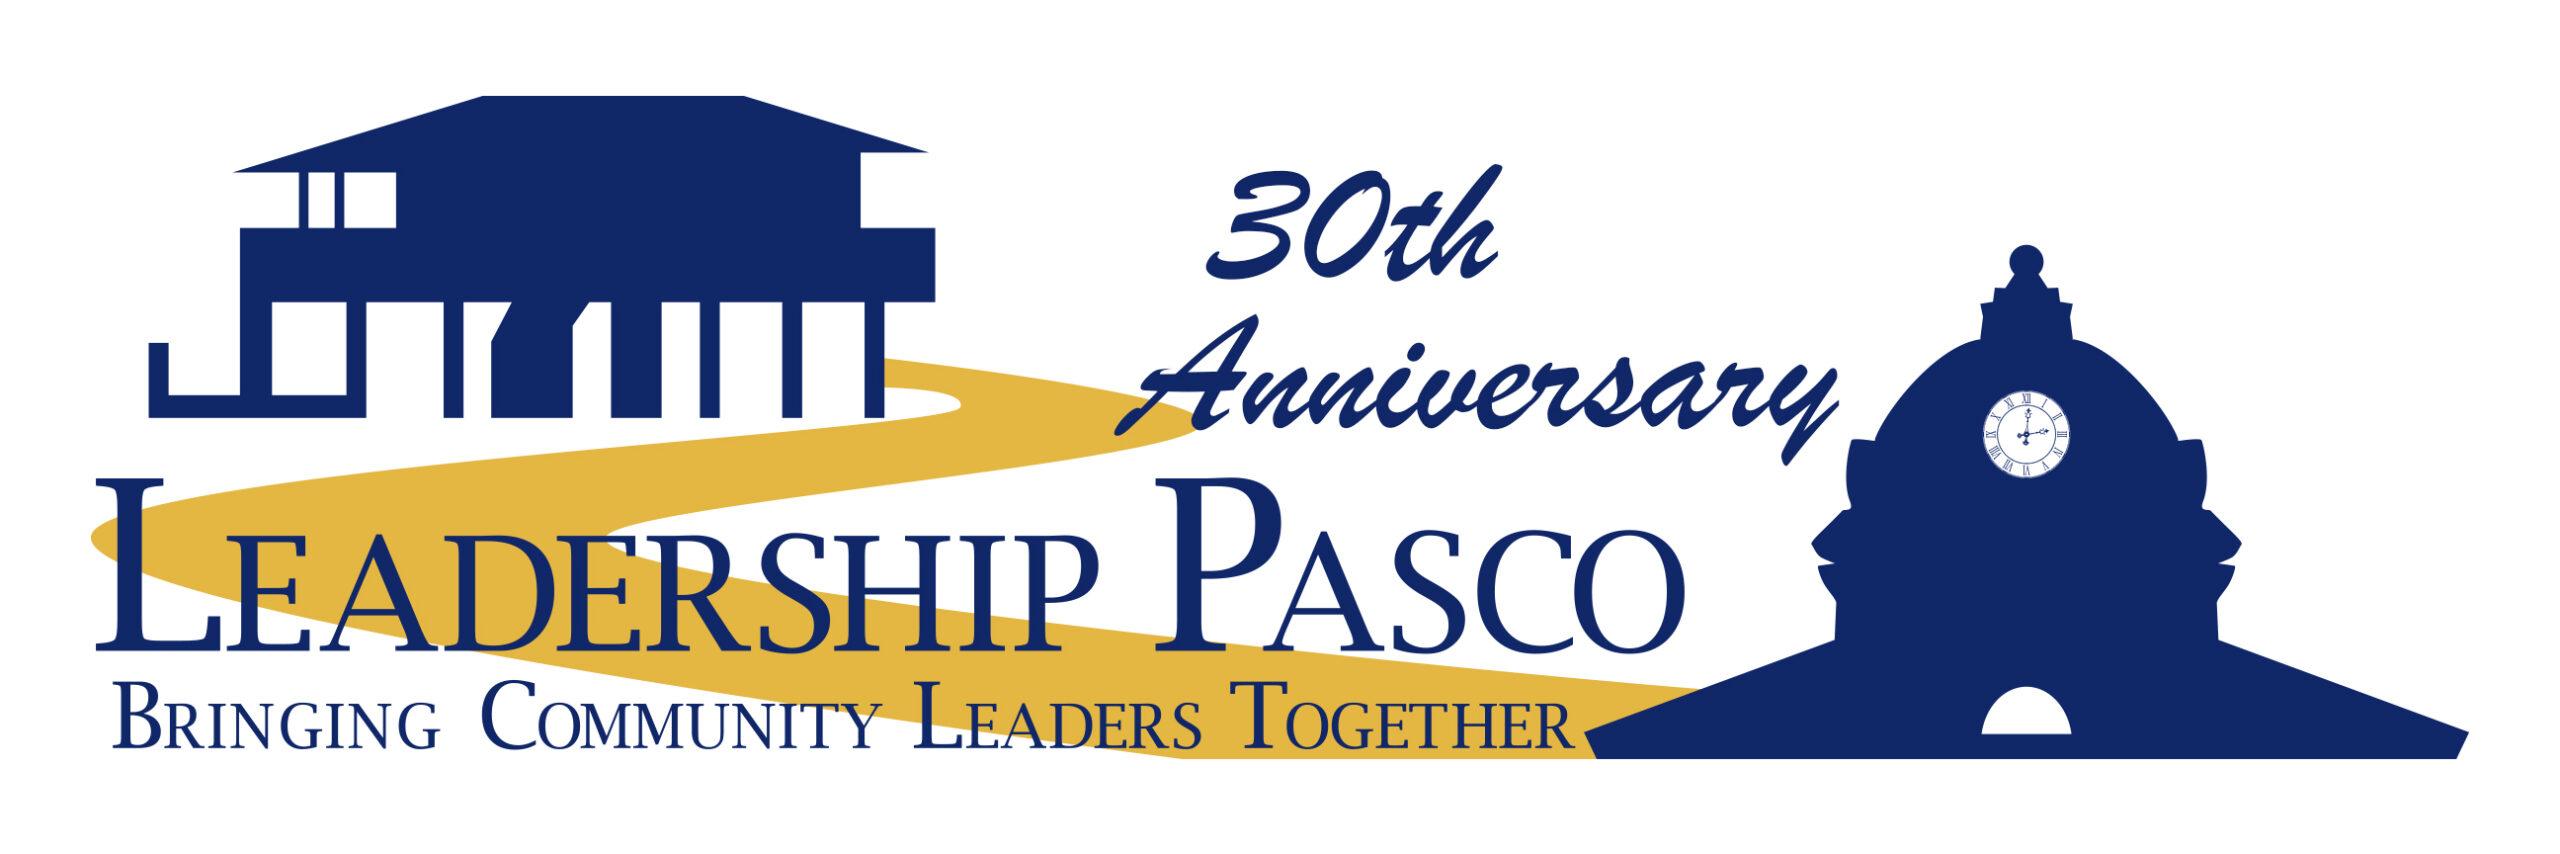 Leadership Pasco 30th logo